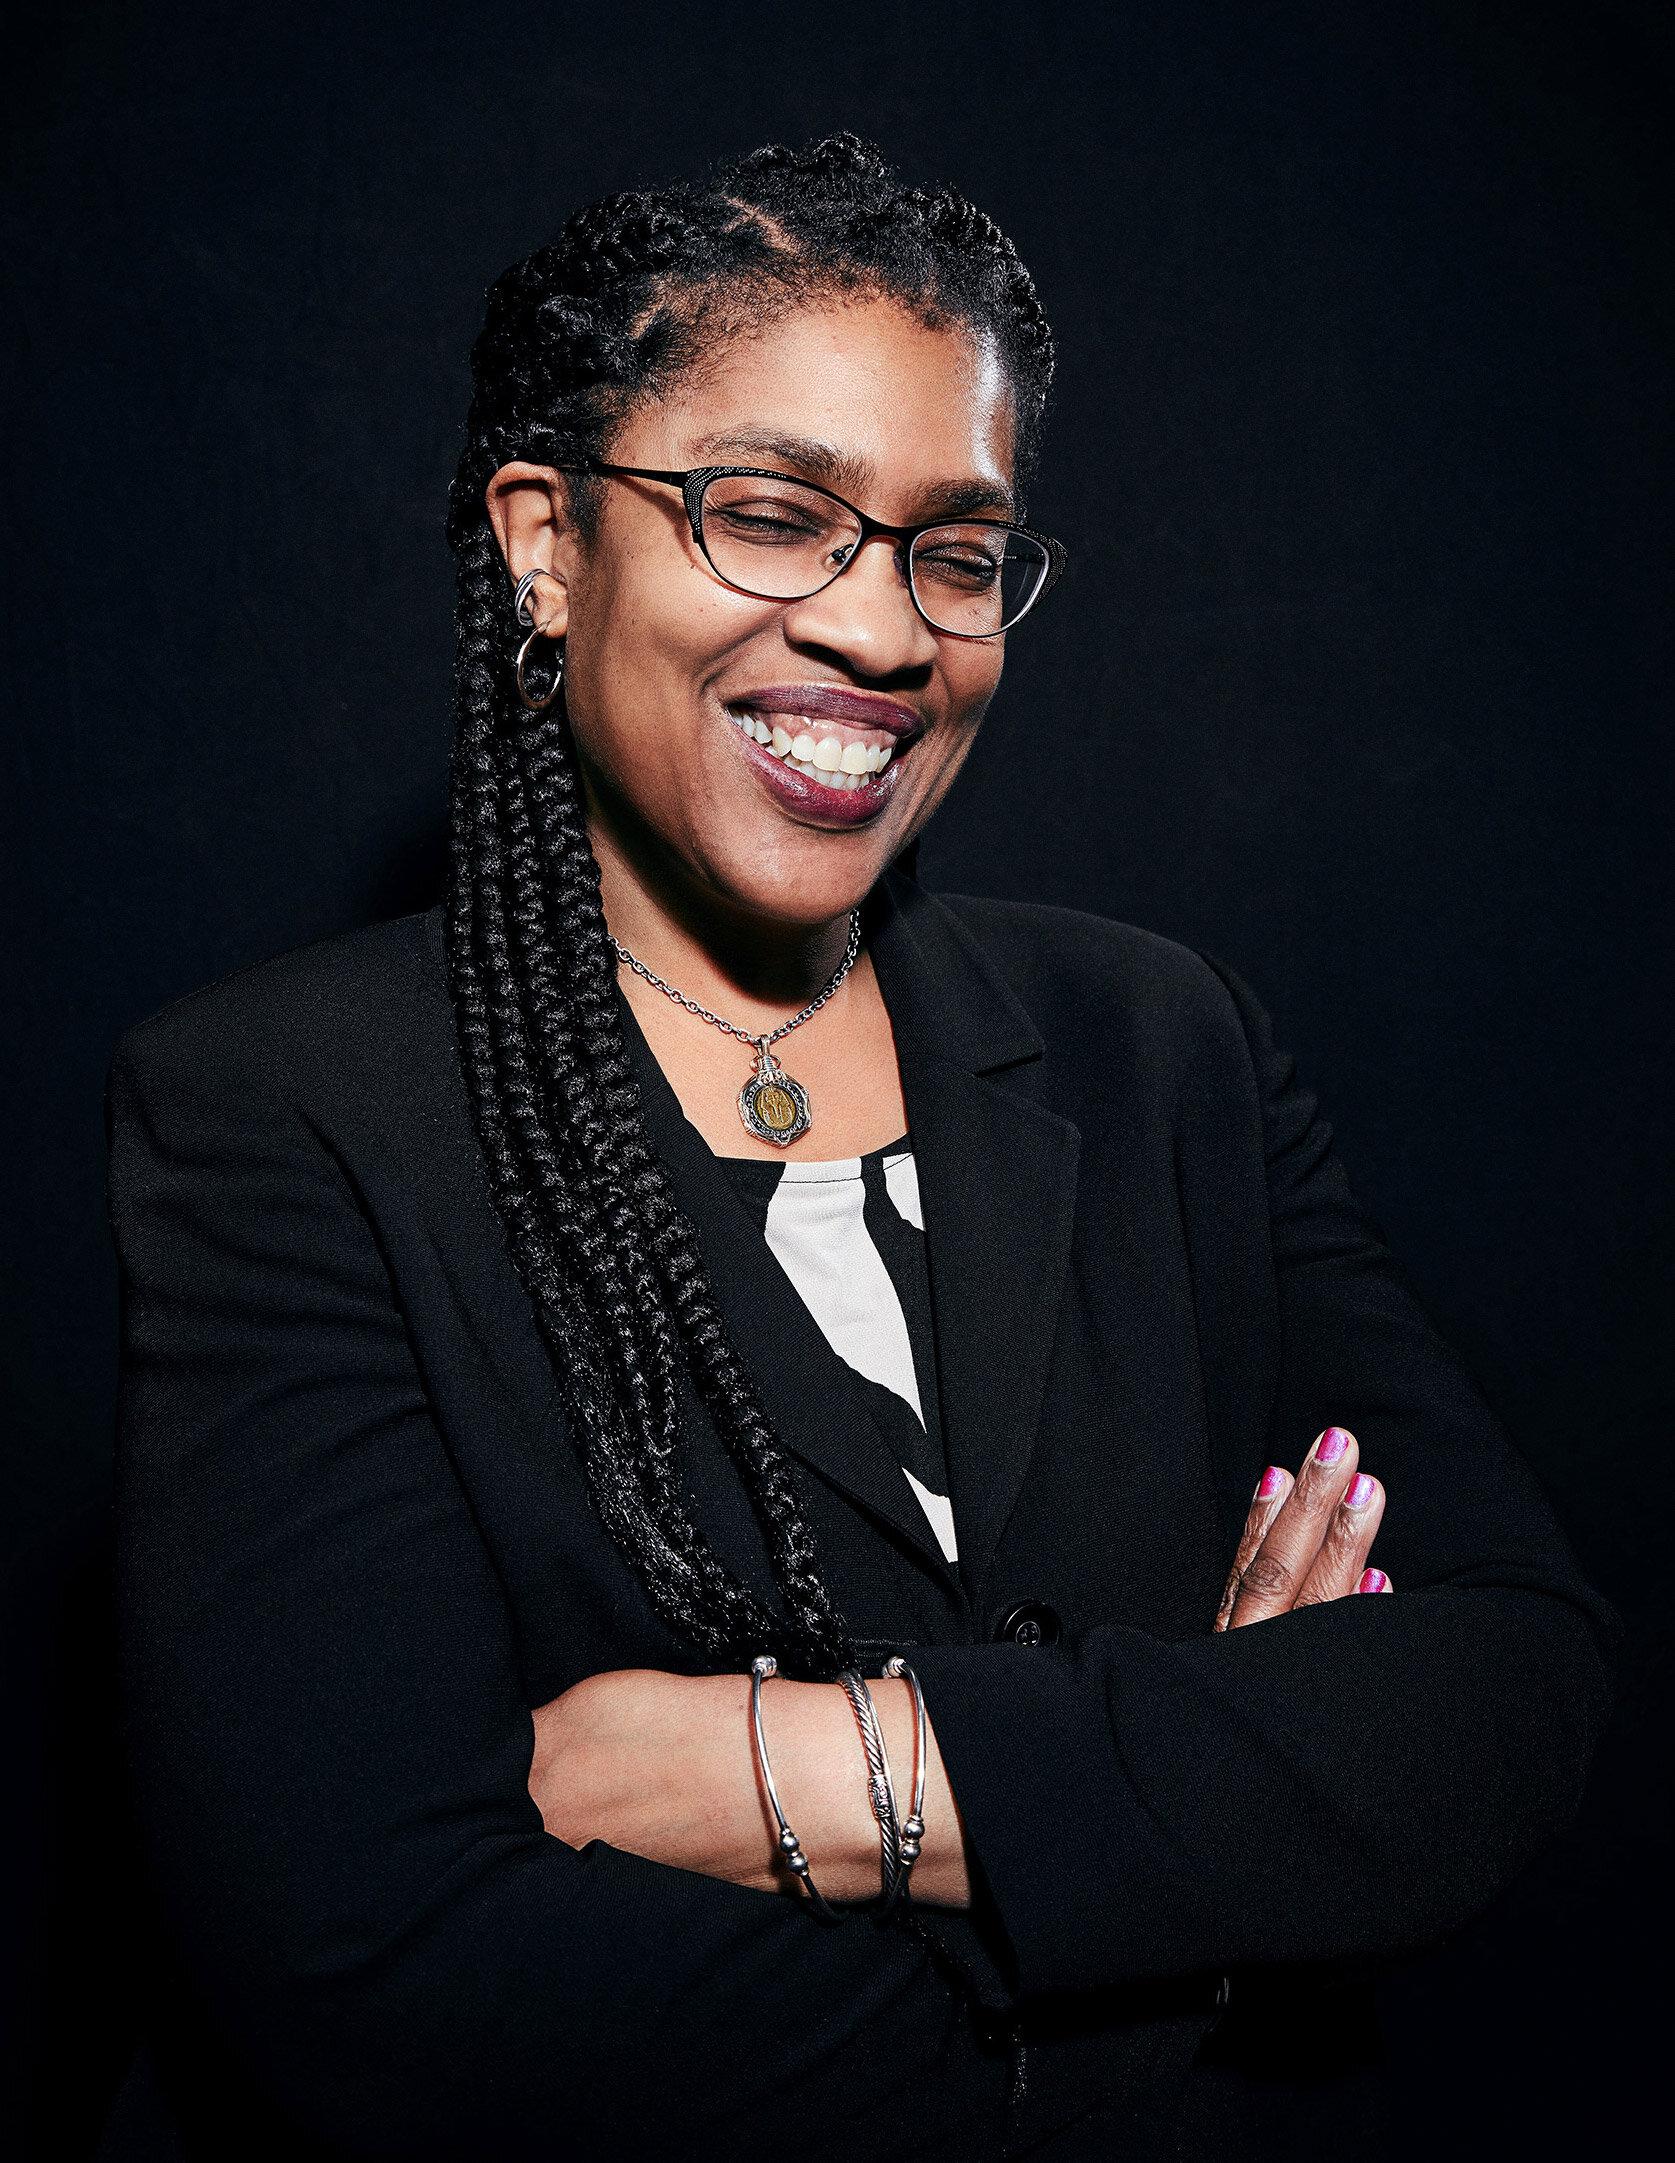 Michele Storms, ACLU of Washington's Executive Director